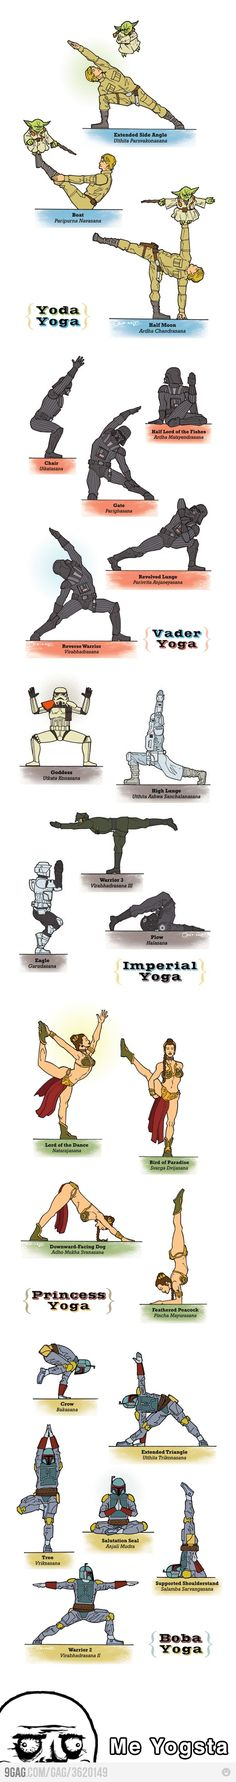 Star Wars yoga. Repinned by Columbus Speech & Hearing Center. For more ideas visit pinterest.com/ColumbusSpeech